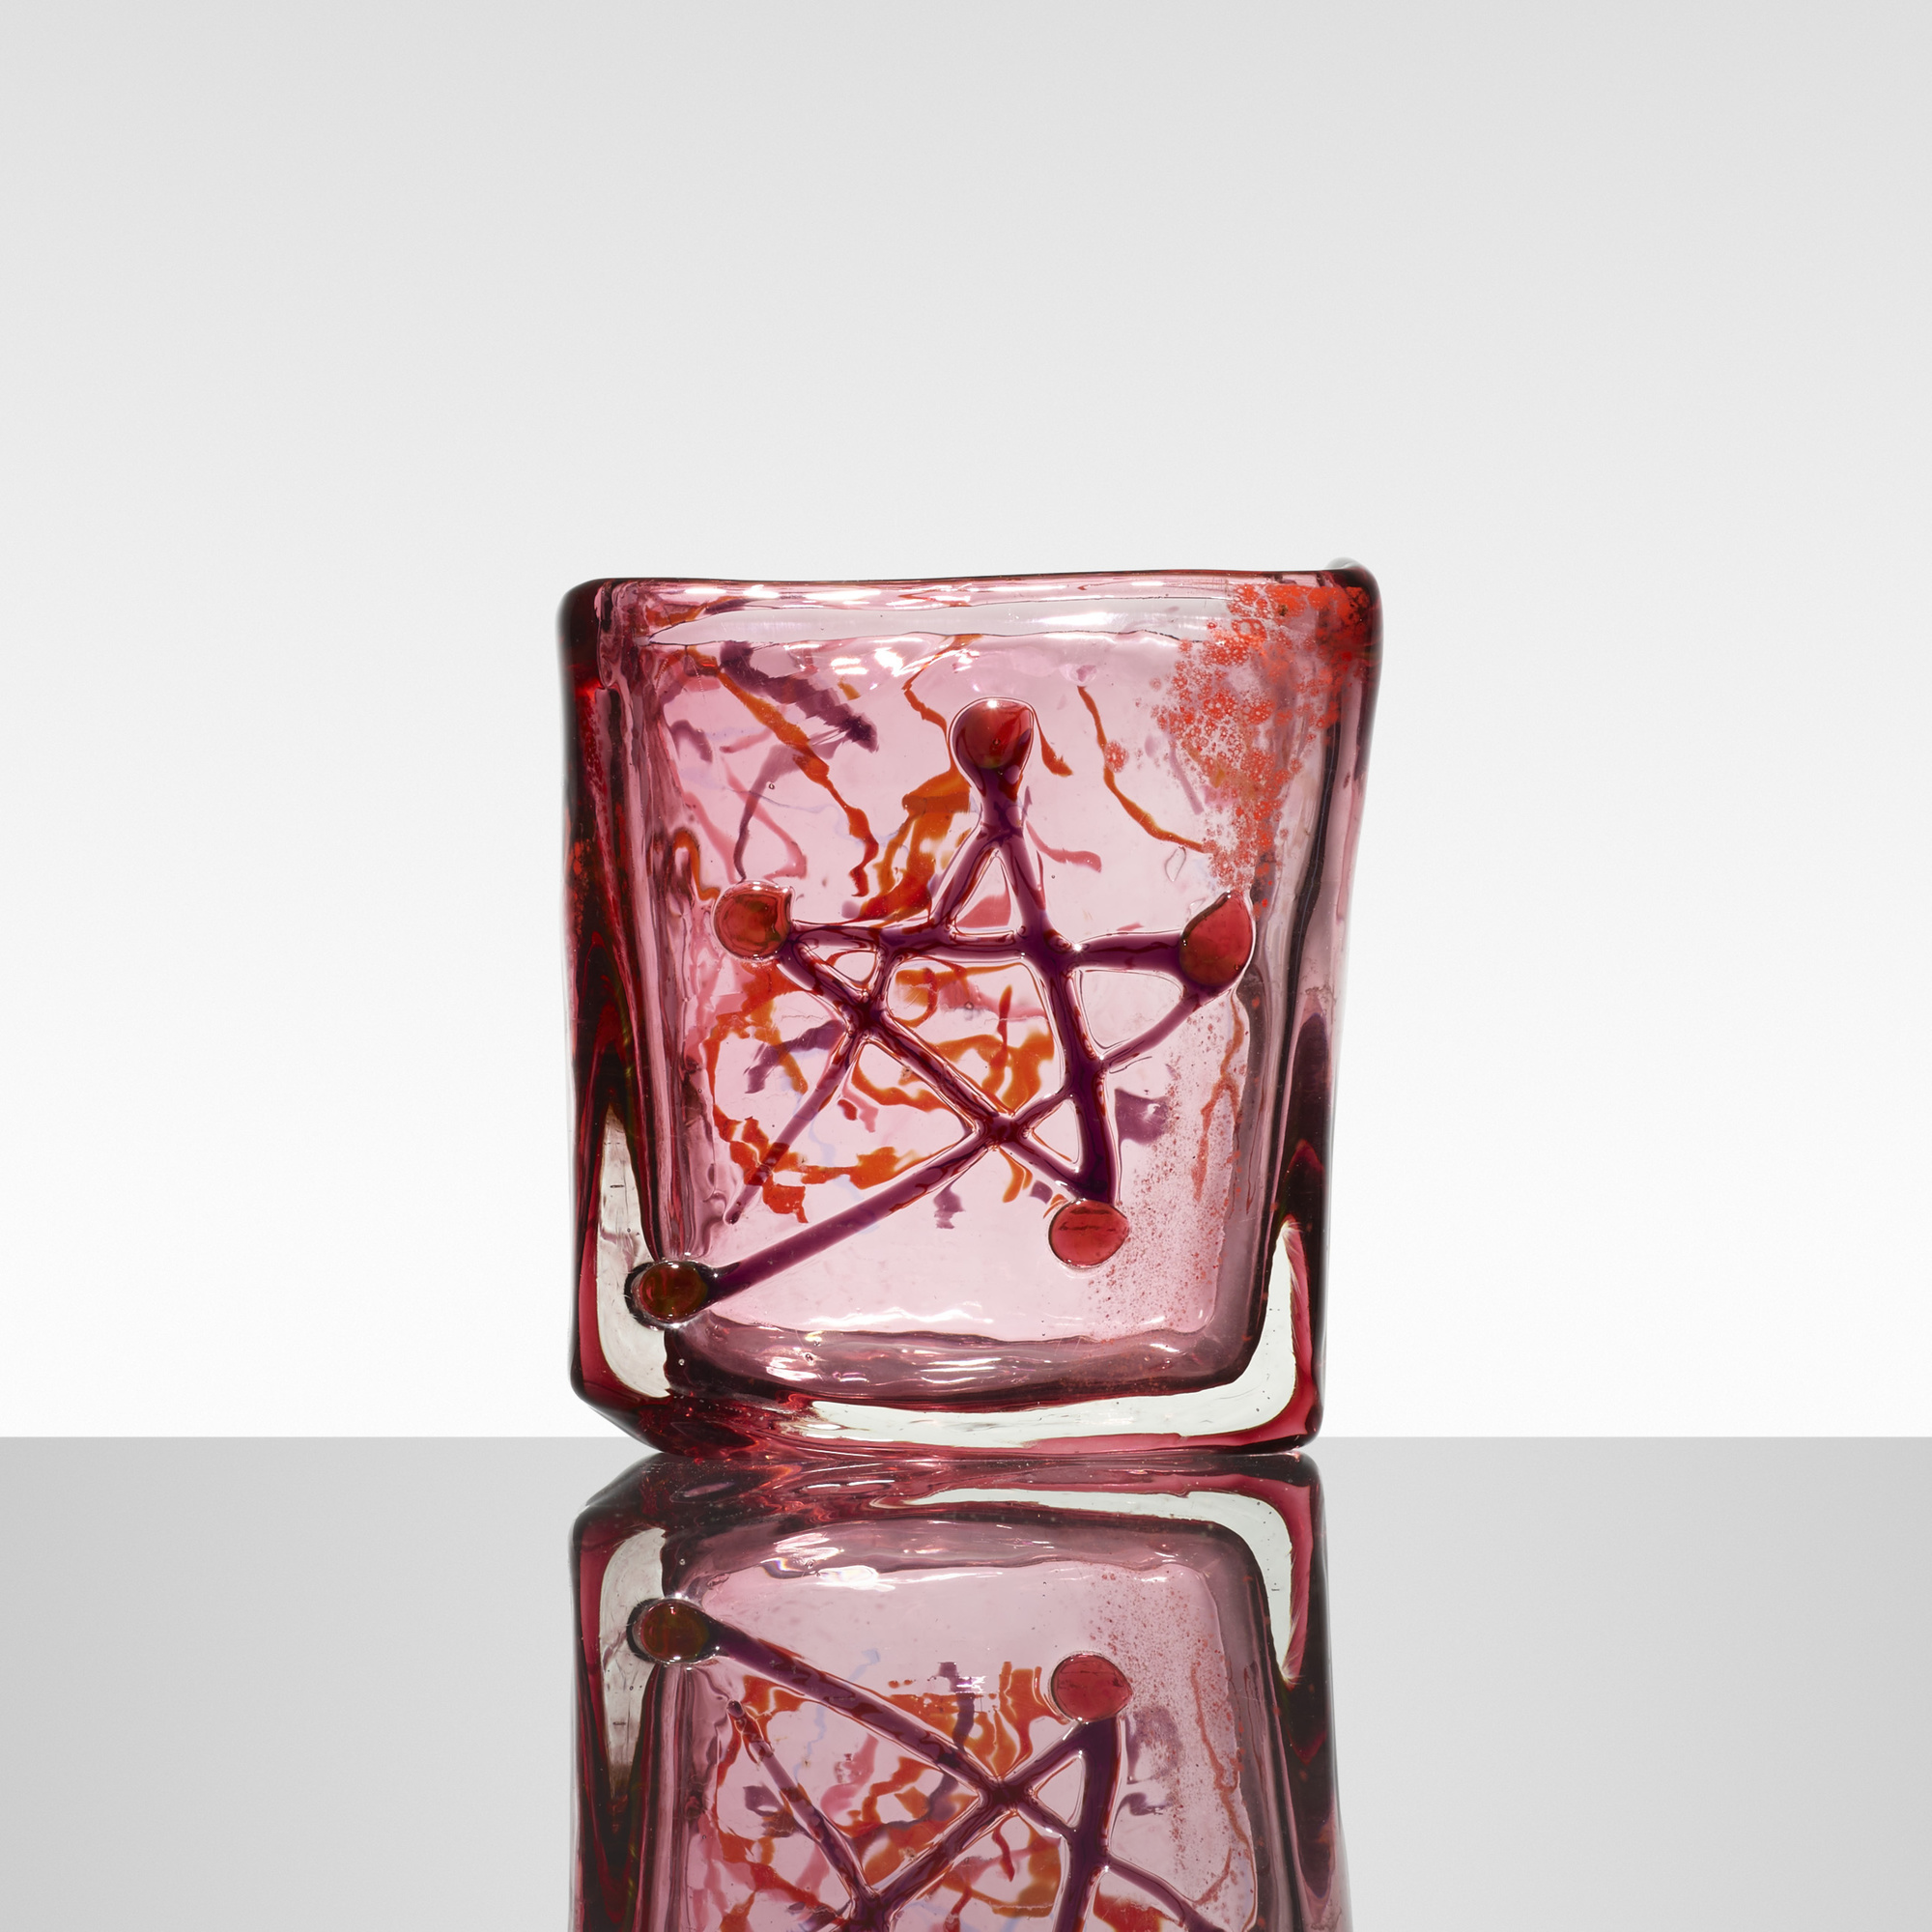 147: Fulvio Bianconi / Rettangolare vase (1 of 3)